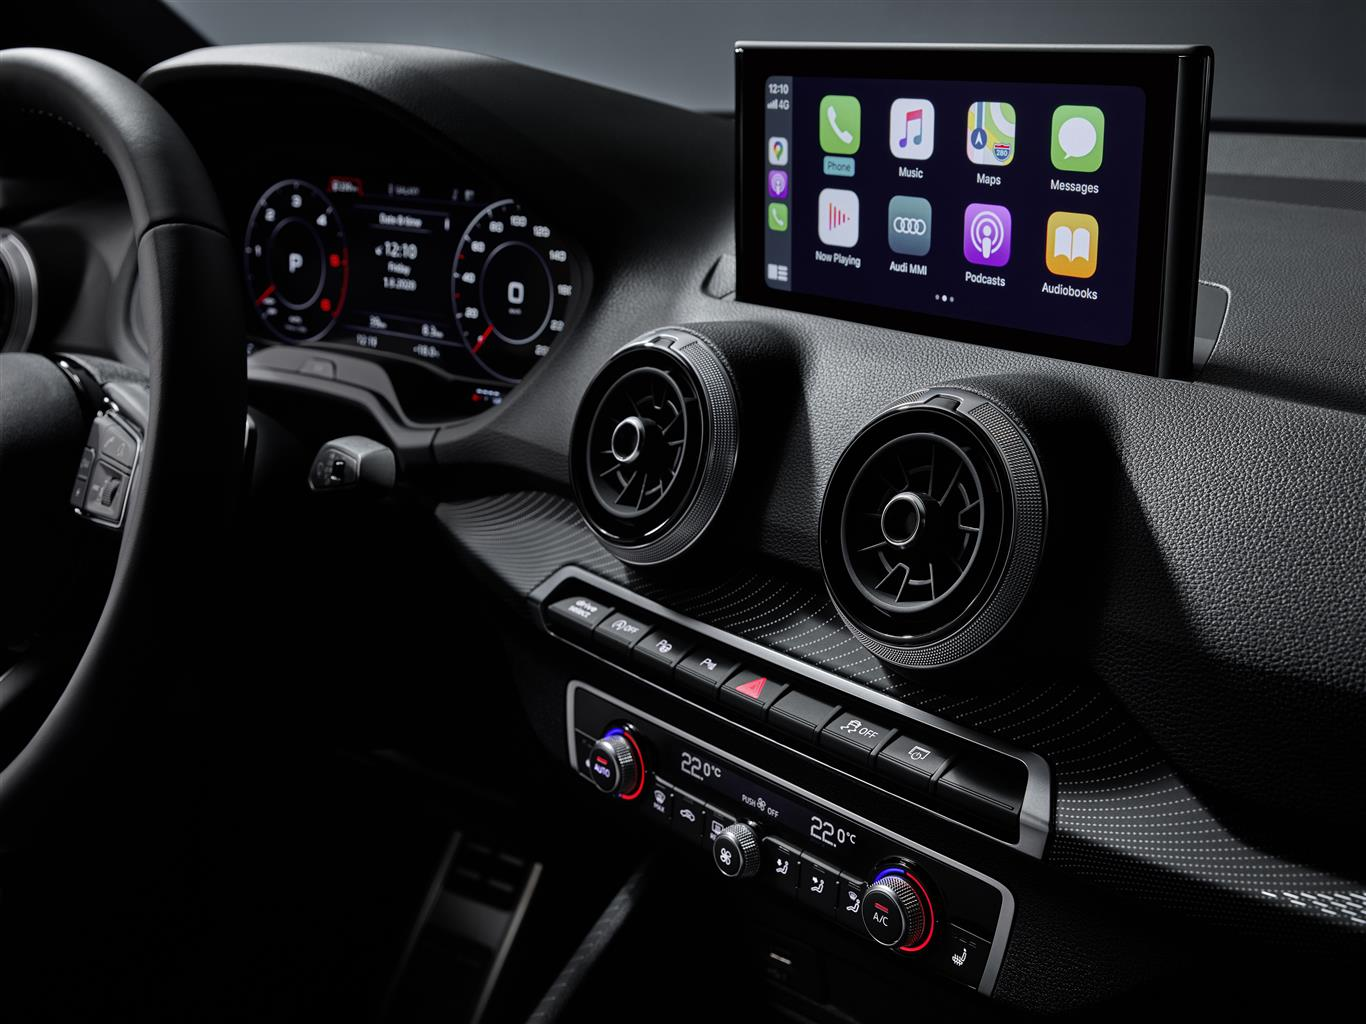 Audi Q2 Infotainment